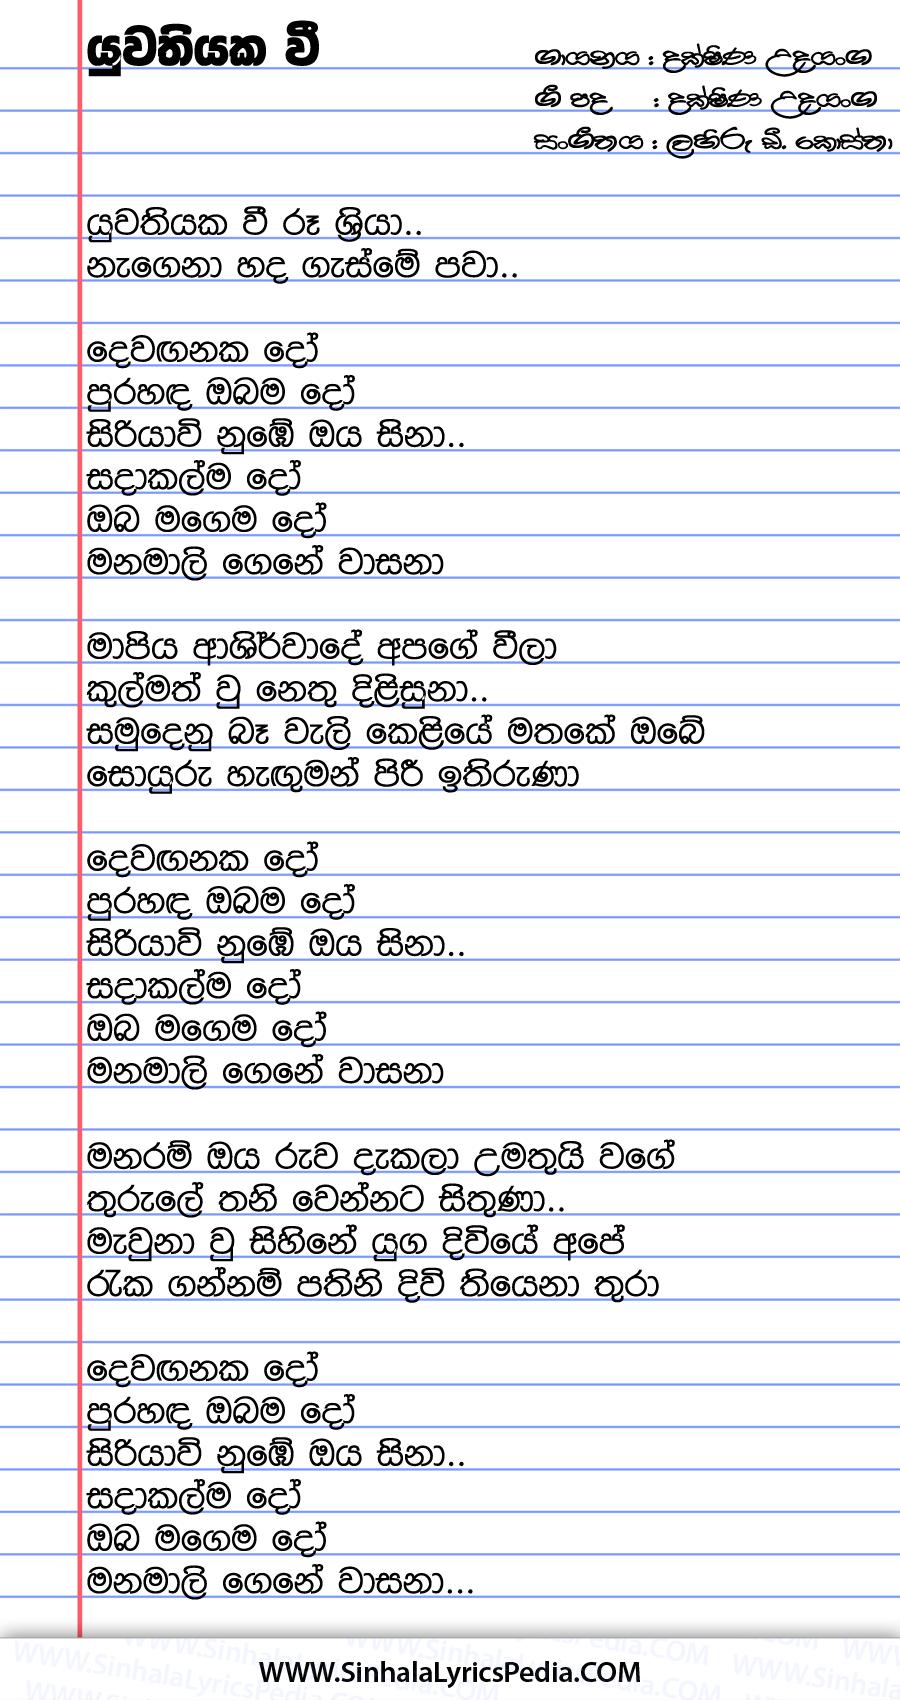 Yuwathiyaka We Rushriya Song Lyrics